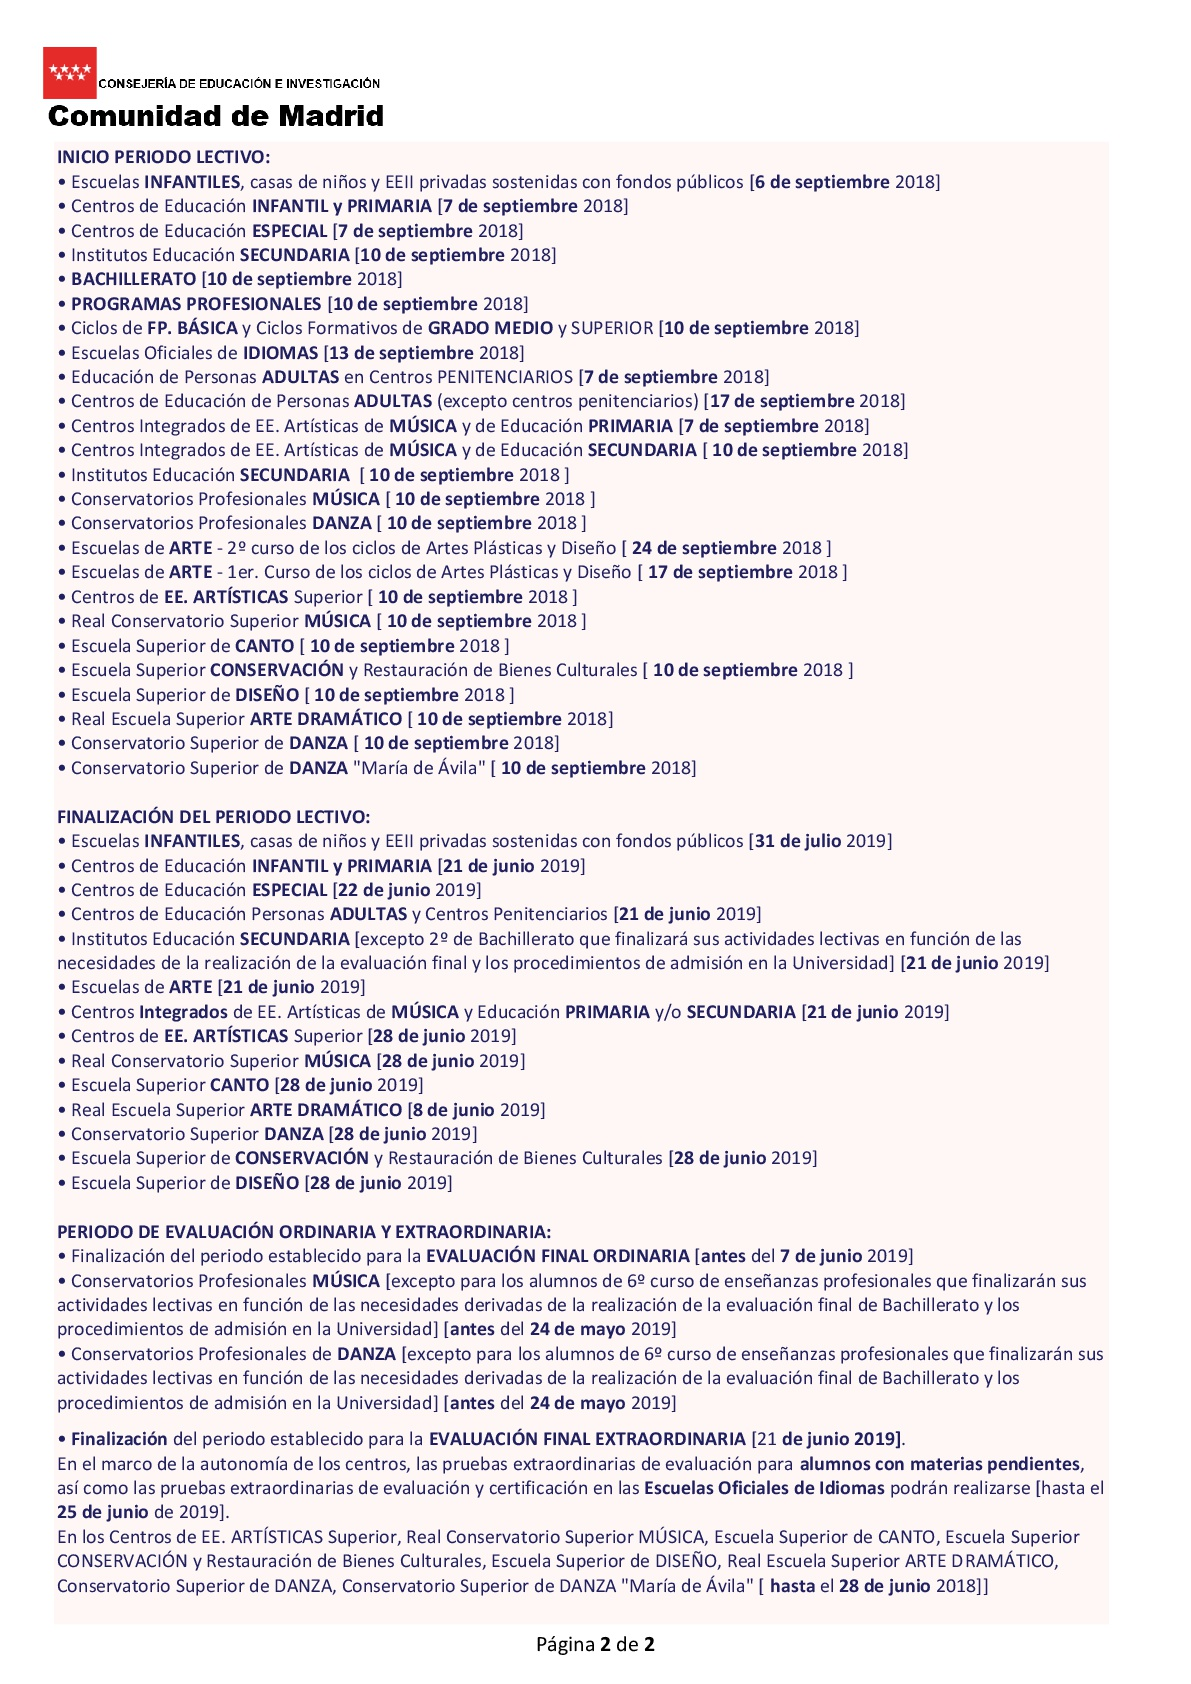 Calendario Escolar 2019 Madrid.Calendario Escolar 2018 19 Padre Piquer